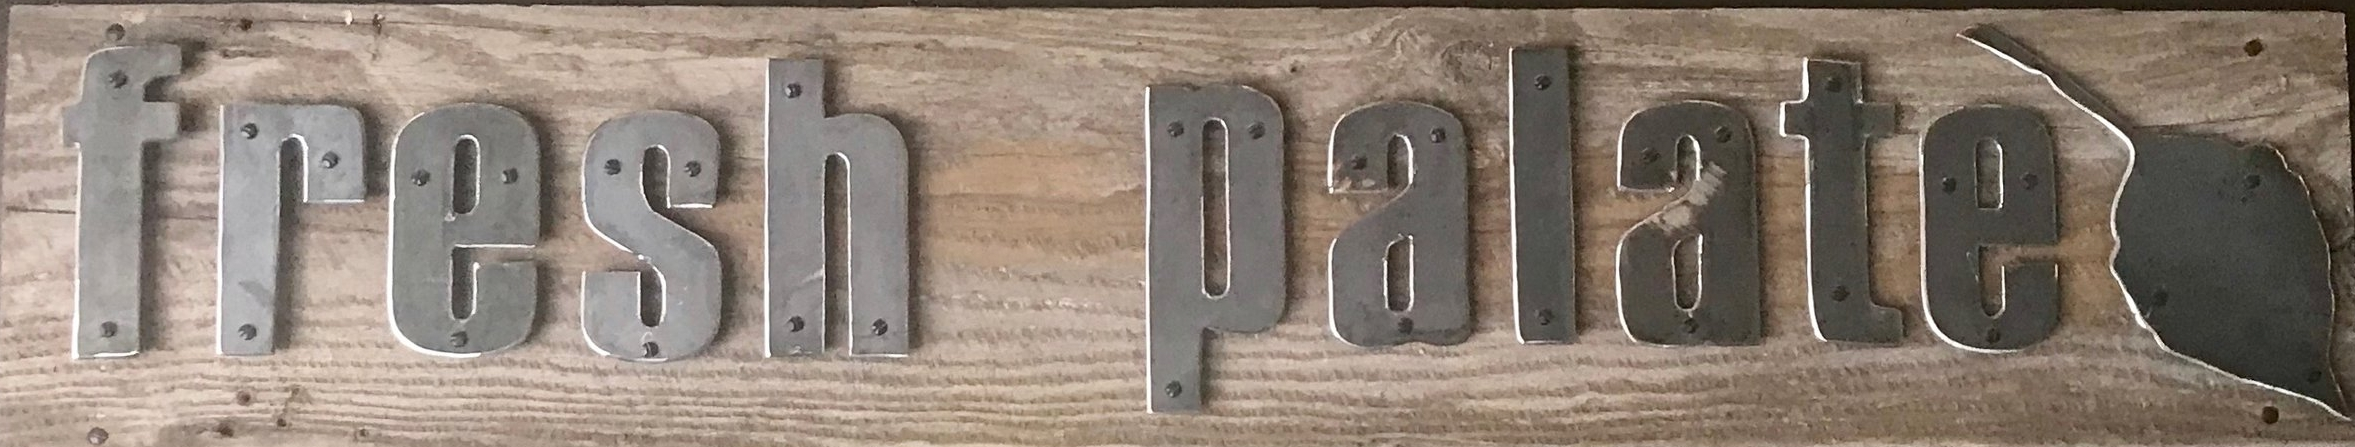 FP wood sign.JPG